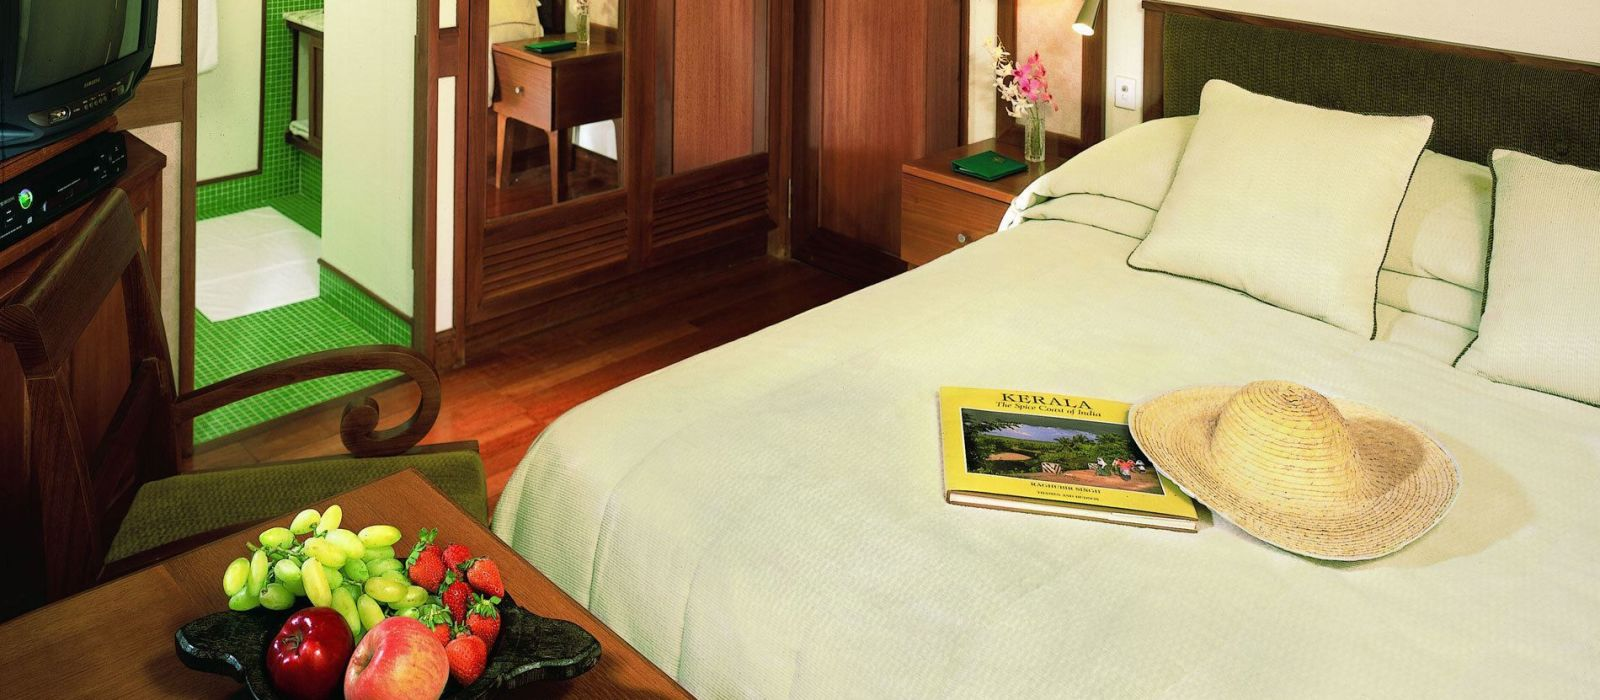 Hotel The Oberoi Motor Vessel Vrinda South India